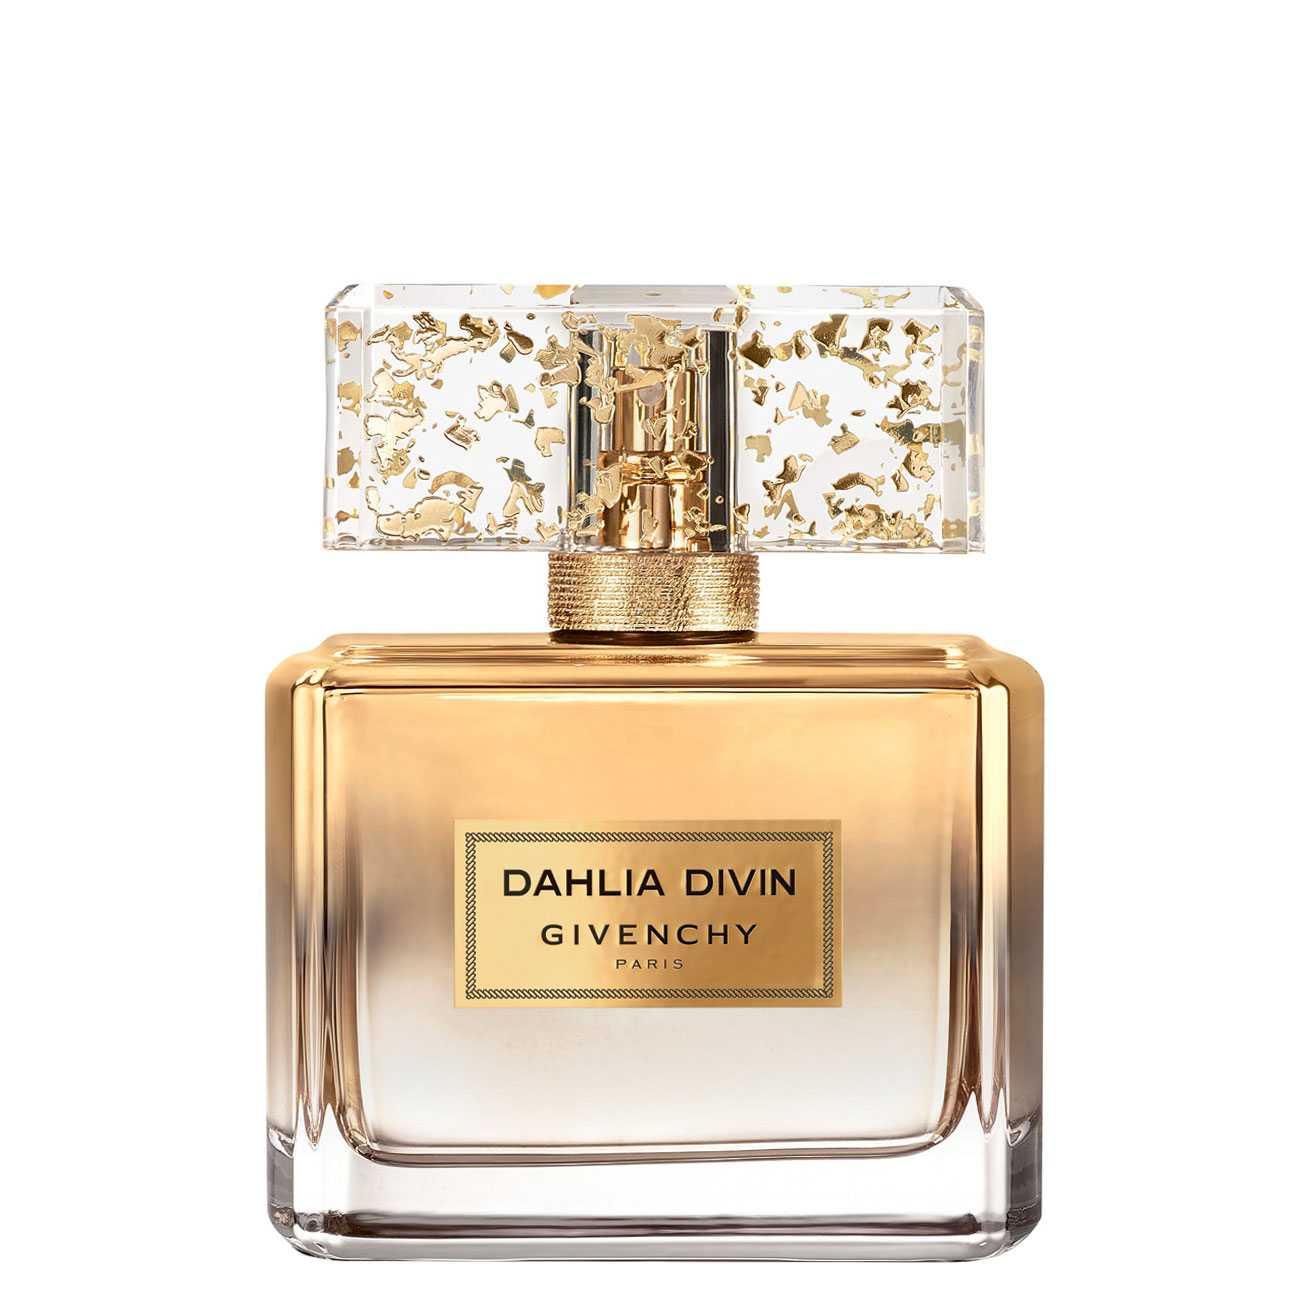 Dahlia Divin Le Nectar 75ml imagine